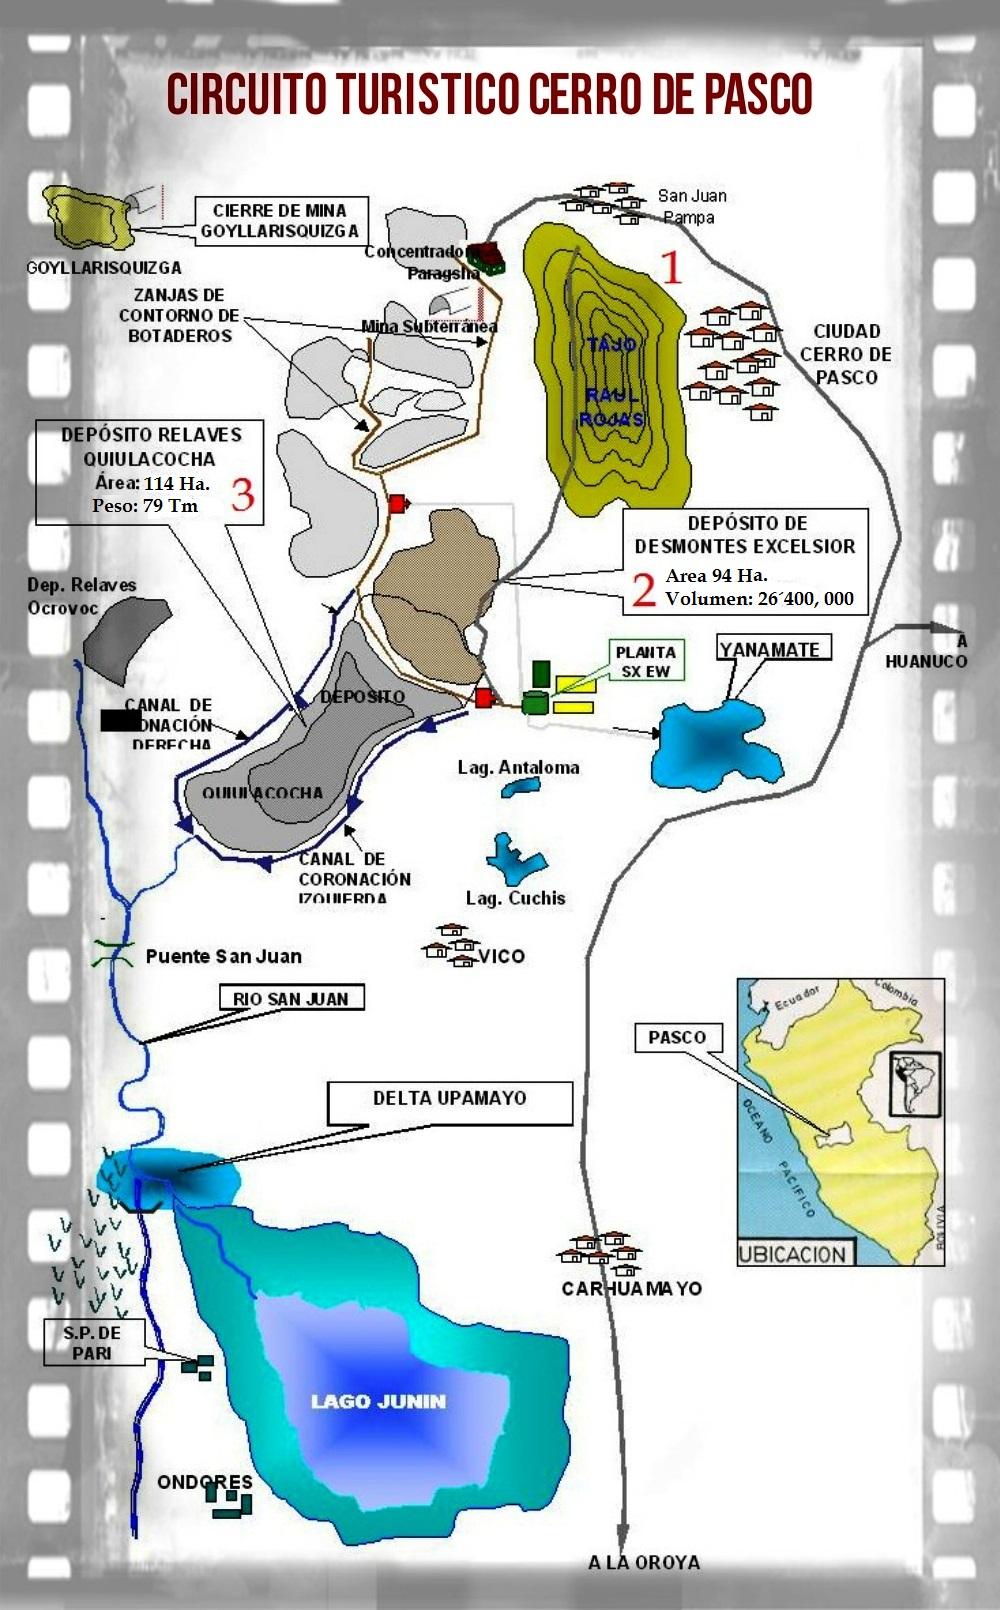 Circuito Turistico Ayacucho : Cerro de pasco circuito turístico la ultima reyna